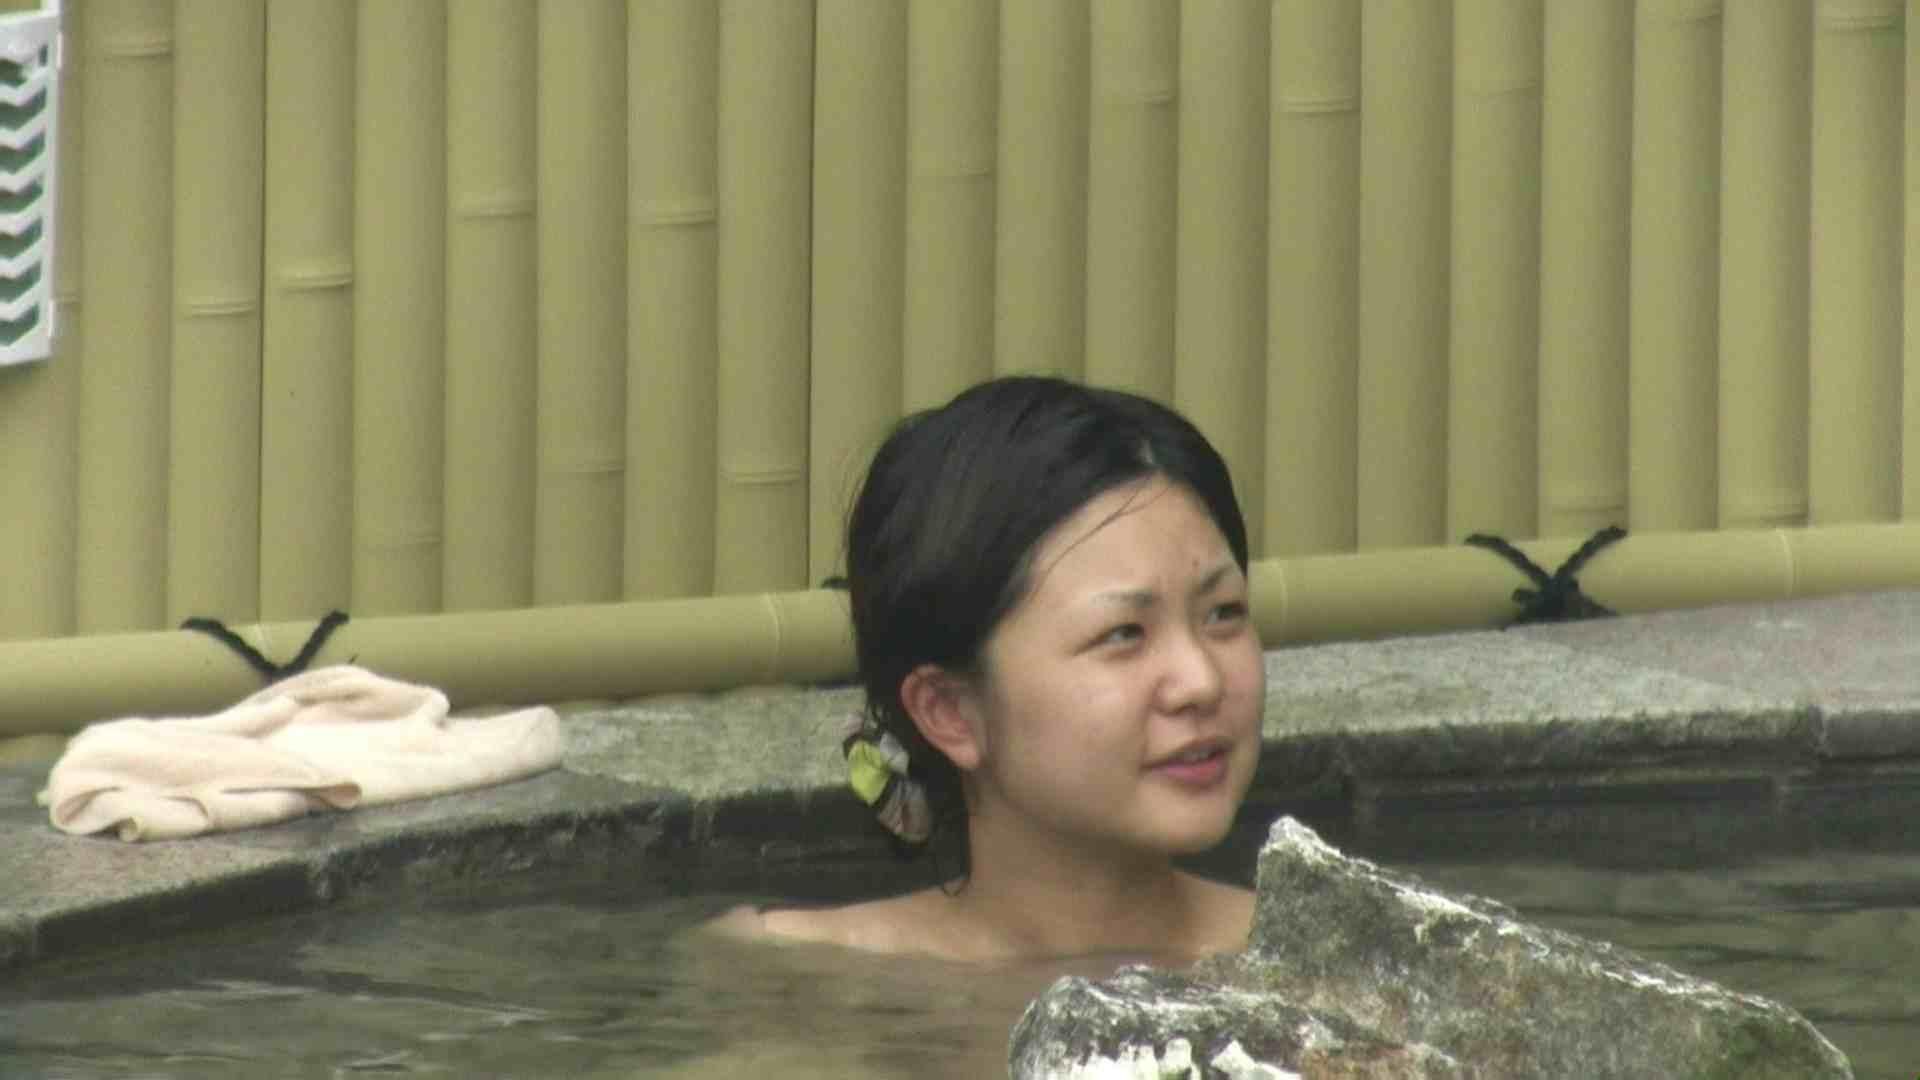 高画質露天女風呂観察 vol.032 露天 盗み撮り動画 103pic 39